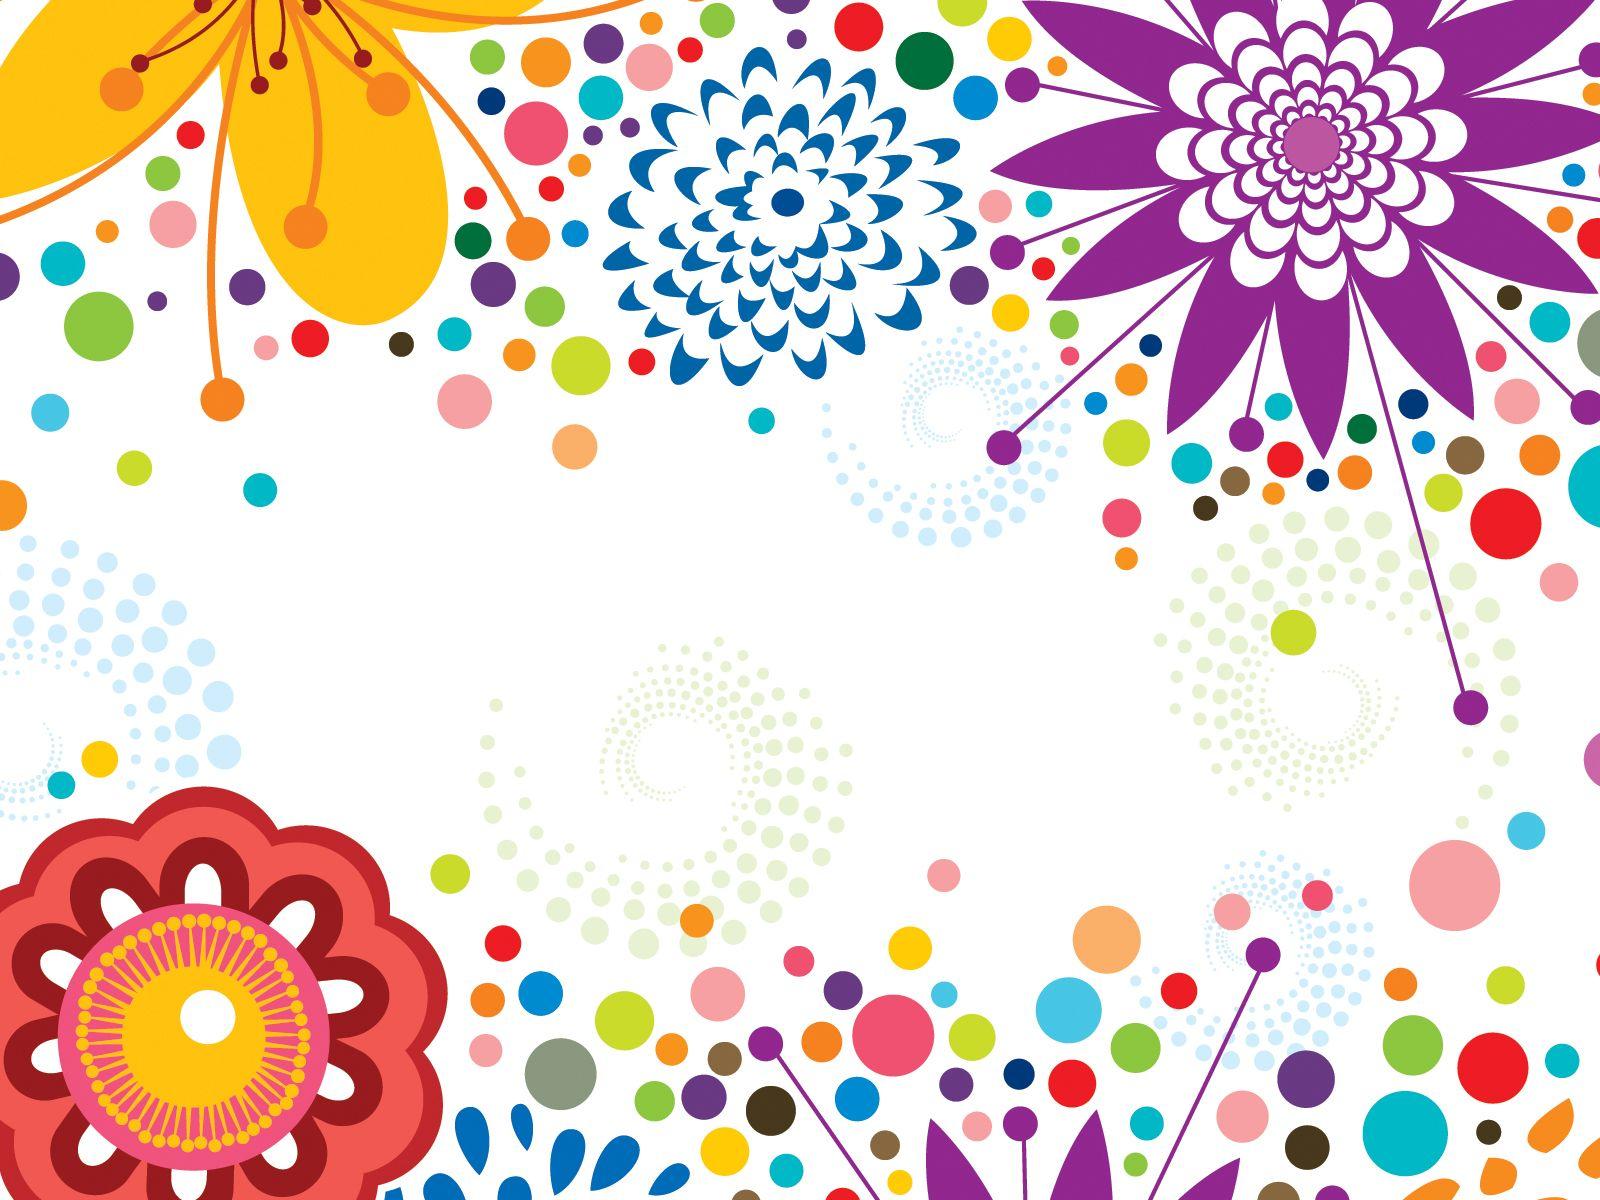 Blue Flower Border Design - ClipArt Best - Cliparts.co   Flower ...